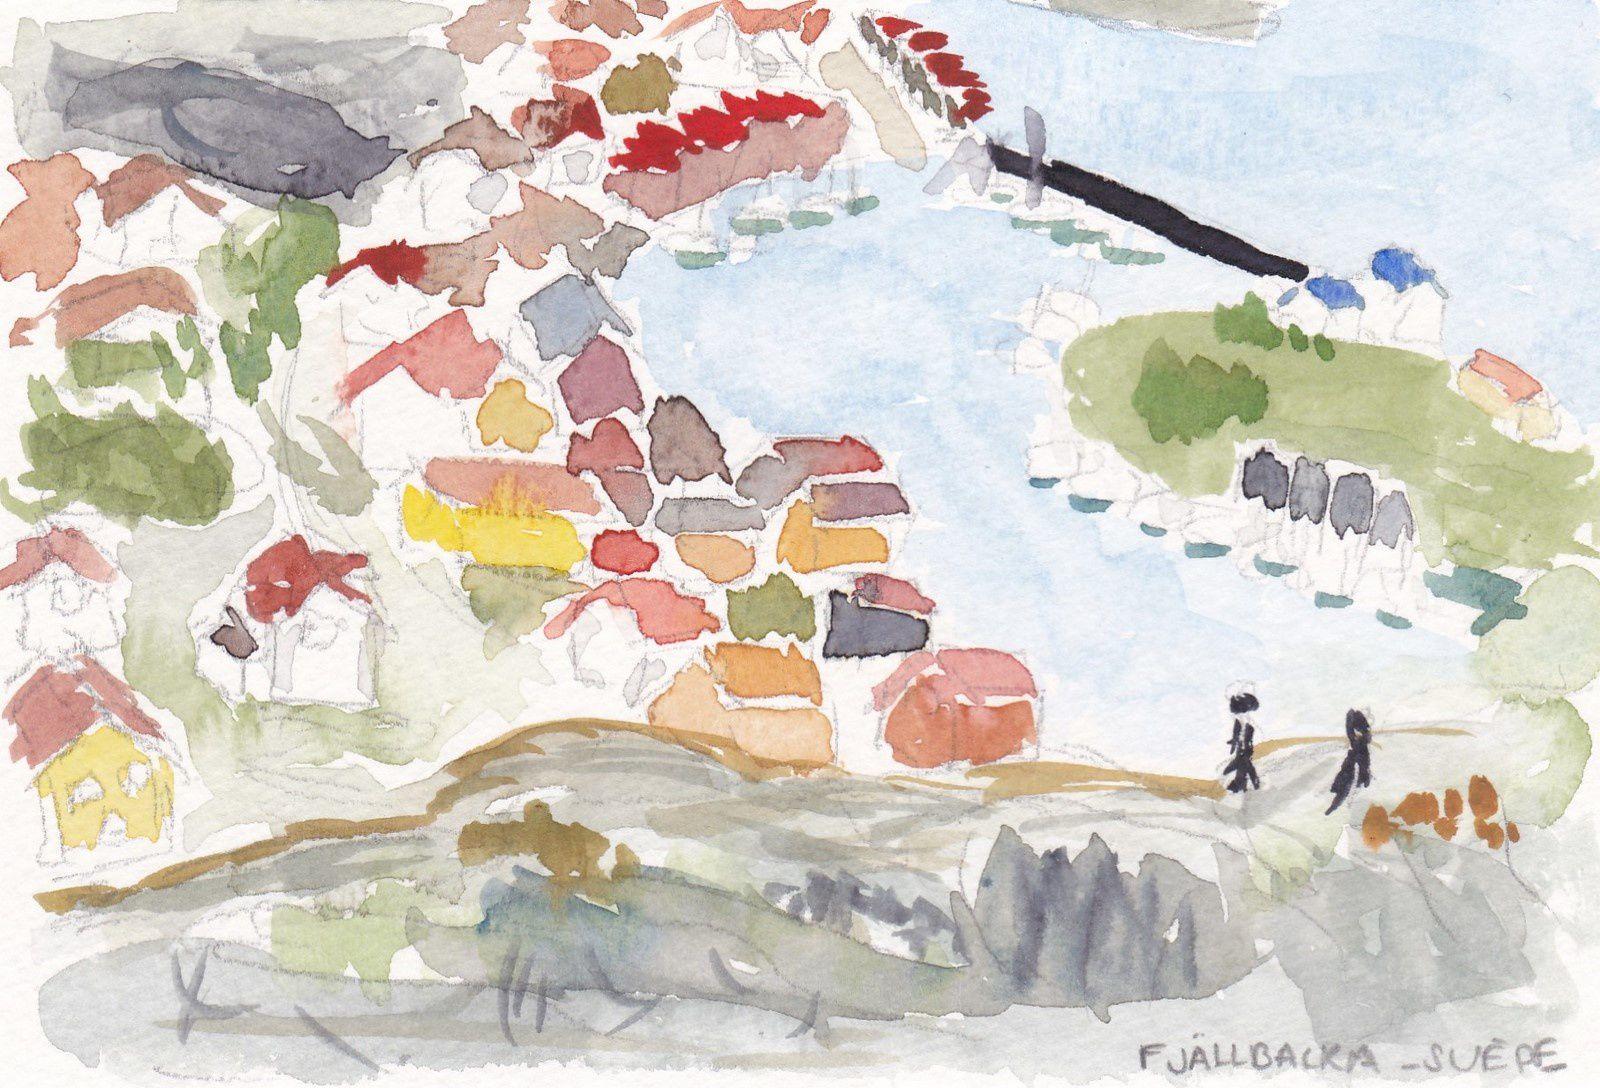 Carte postale d'un voyage imaginaire #2 - Fjällbacka (Suède)